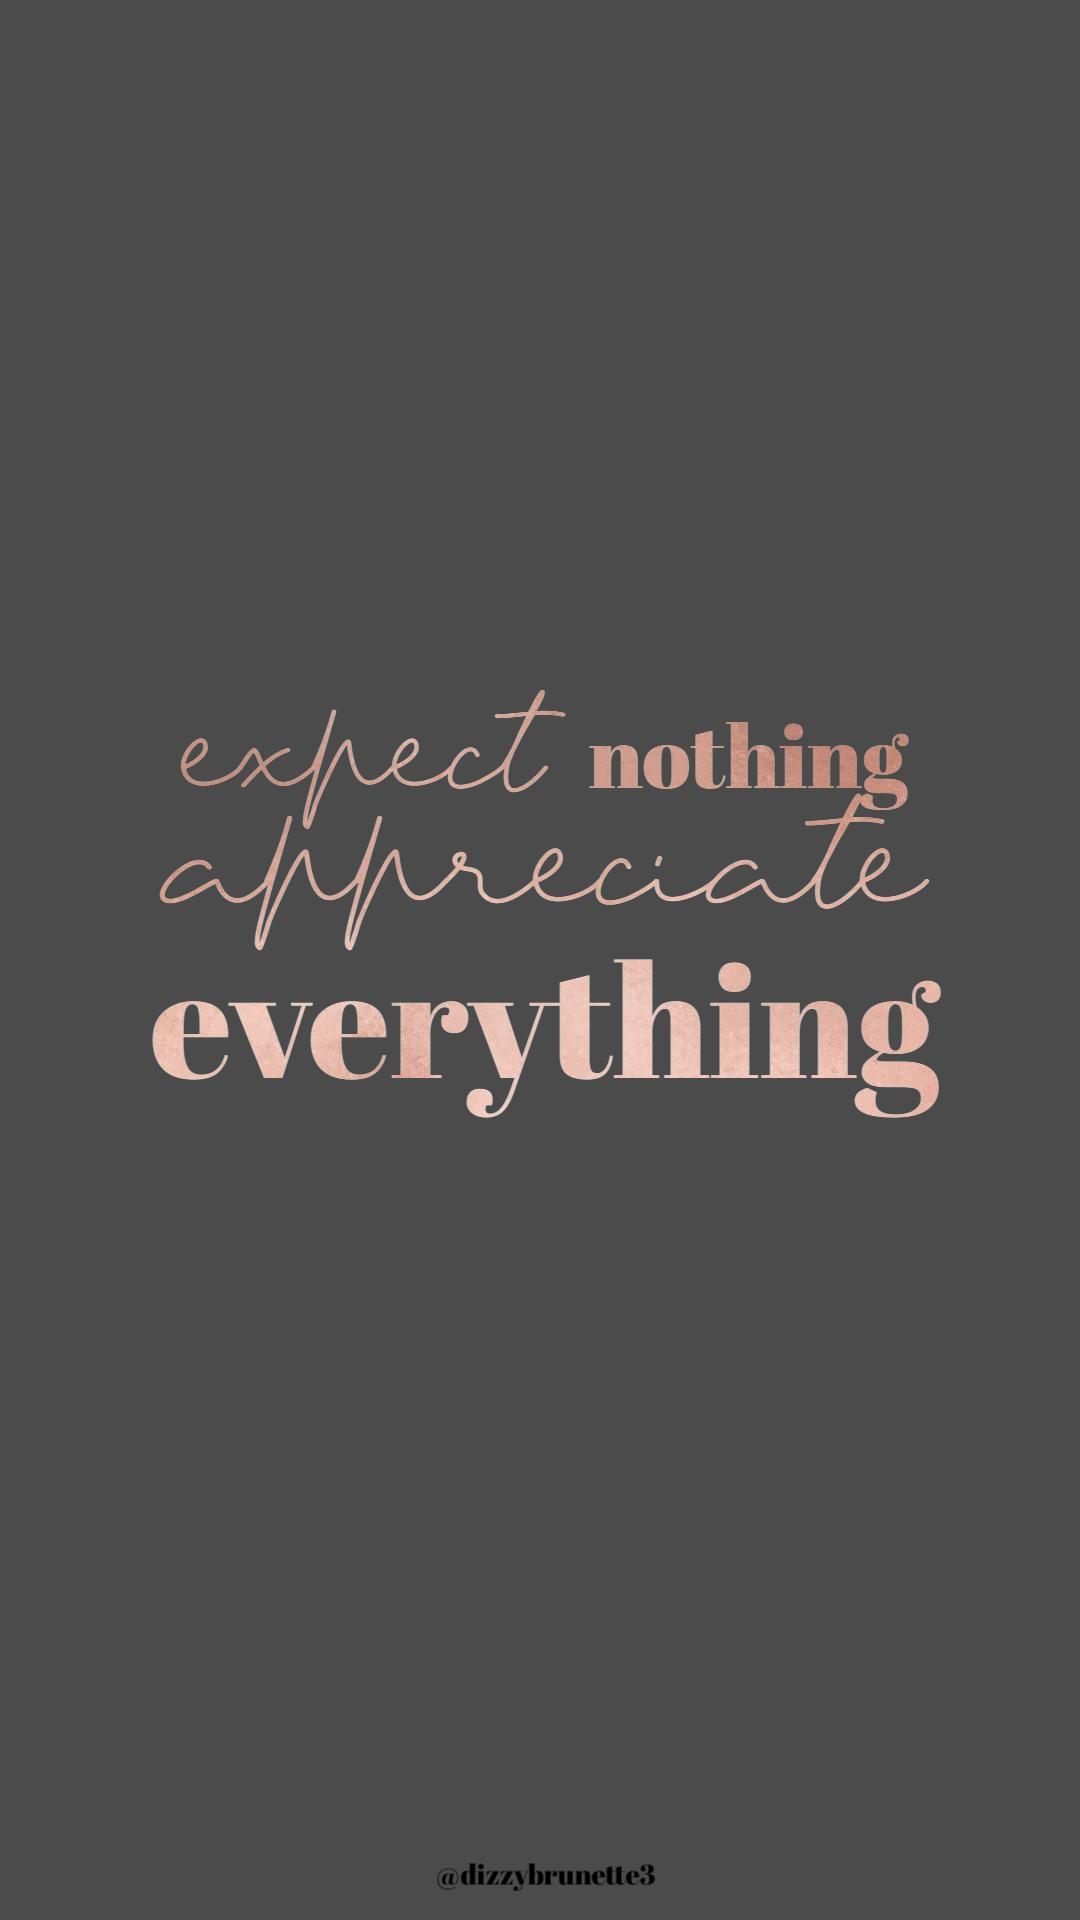 Quotes Motivation Inspiration Parenting Influencer 2020 Mom Blogger Influencer Mlm Phone Wallpapers Scree Life Quotes Inspirational Quotes Words Quotes